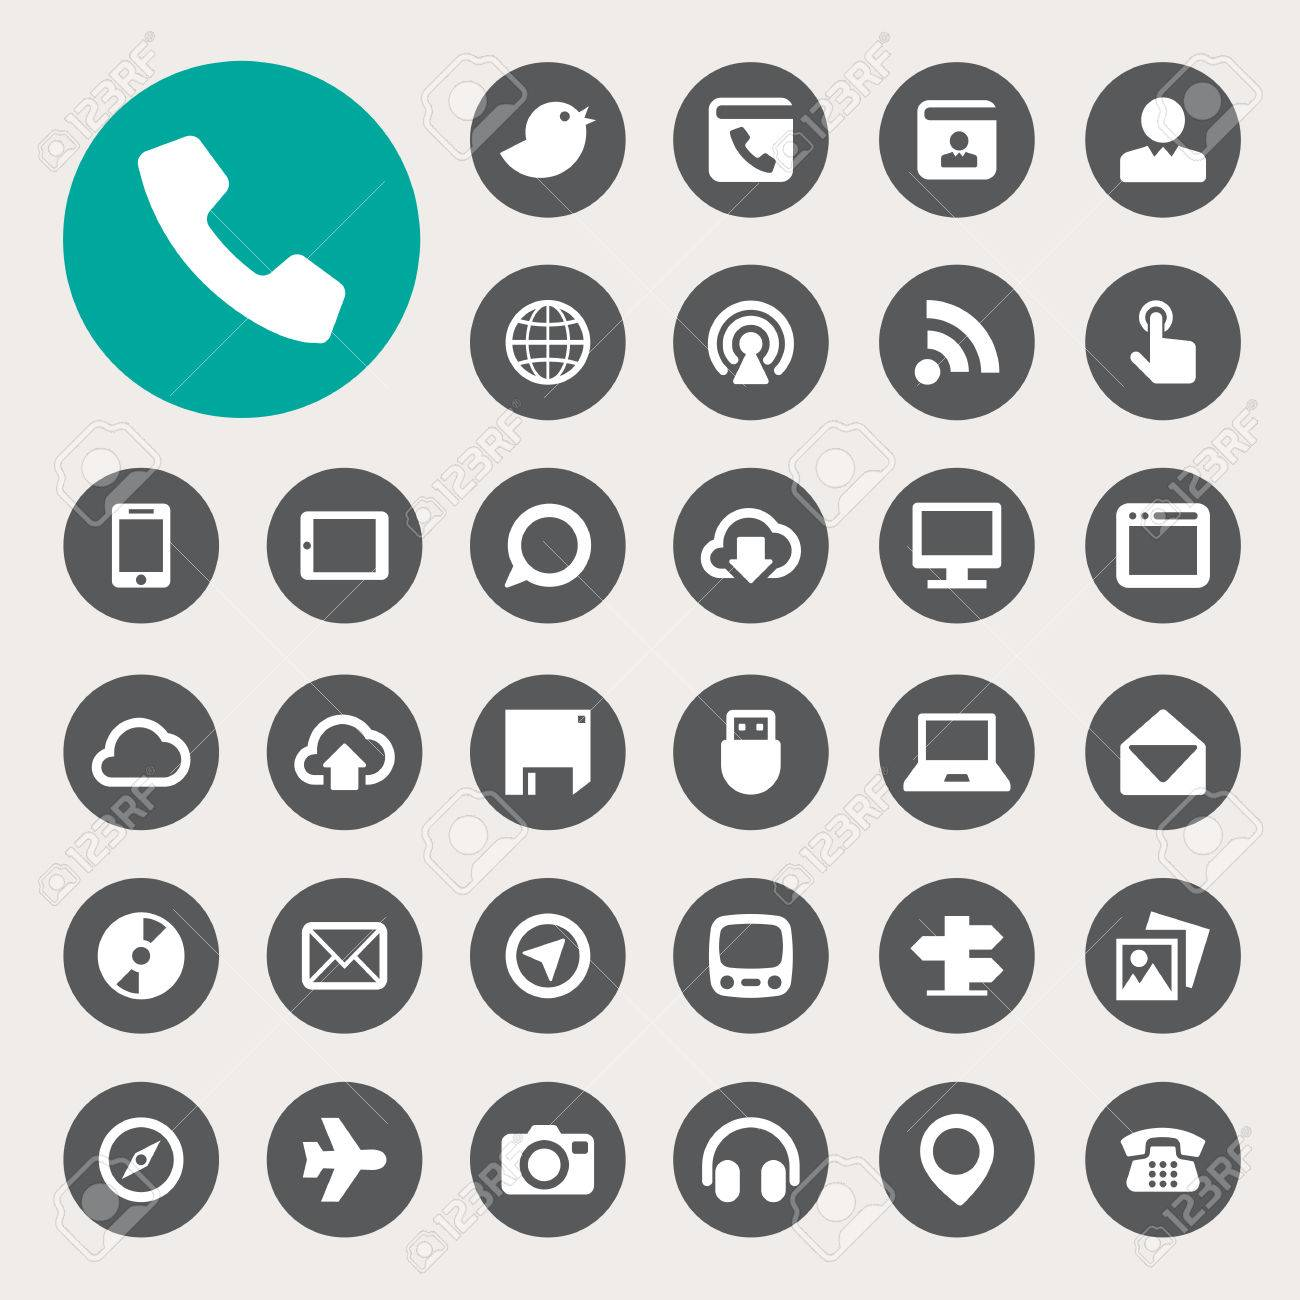 Communication and transportaion icon set .Illustration eps10 - 29100282